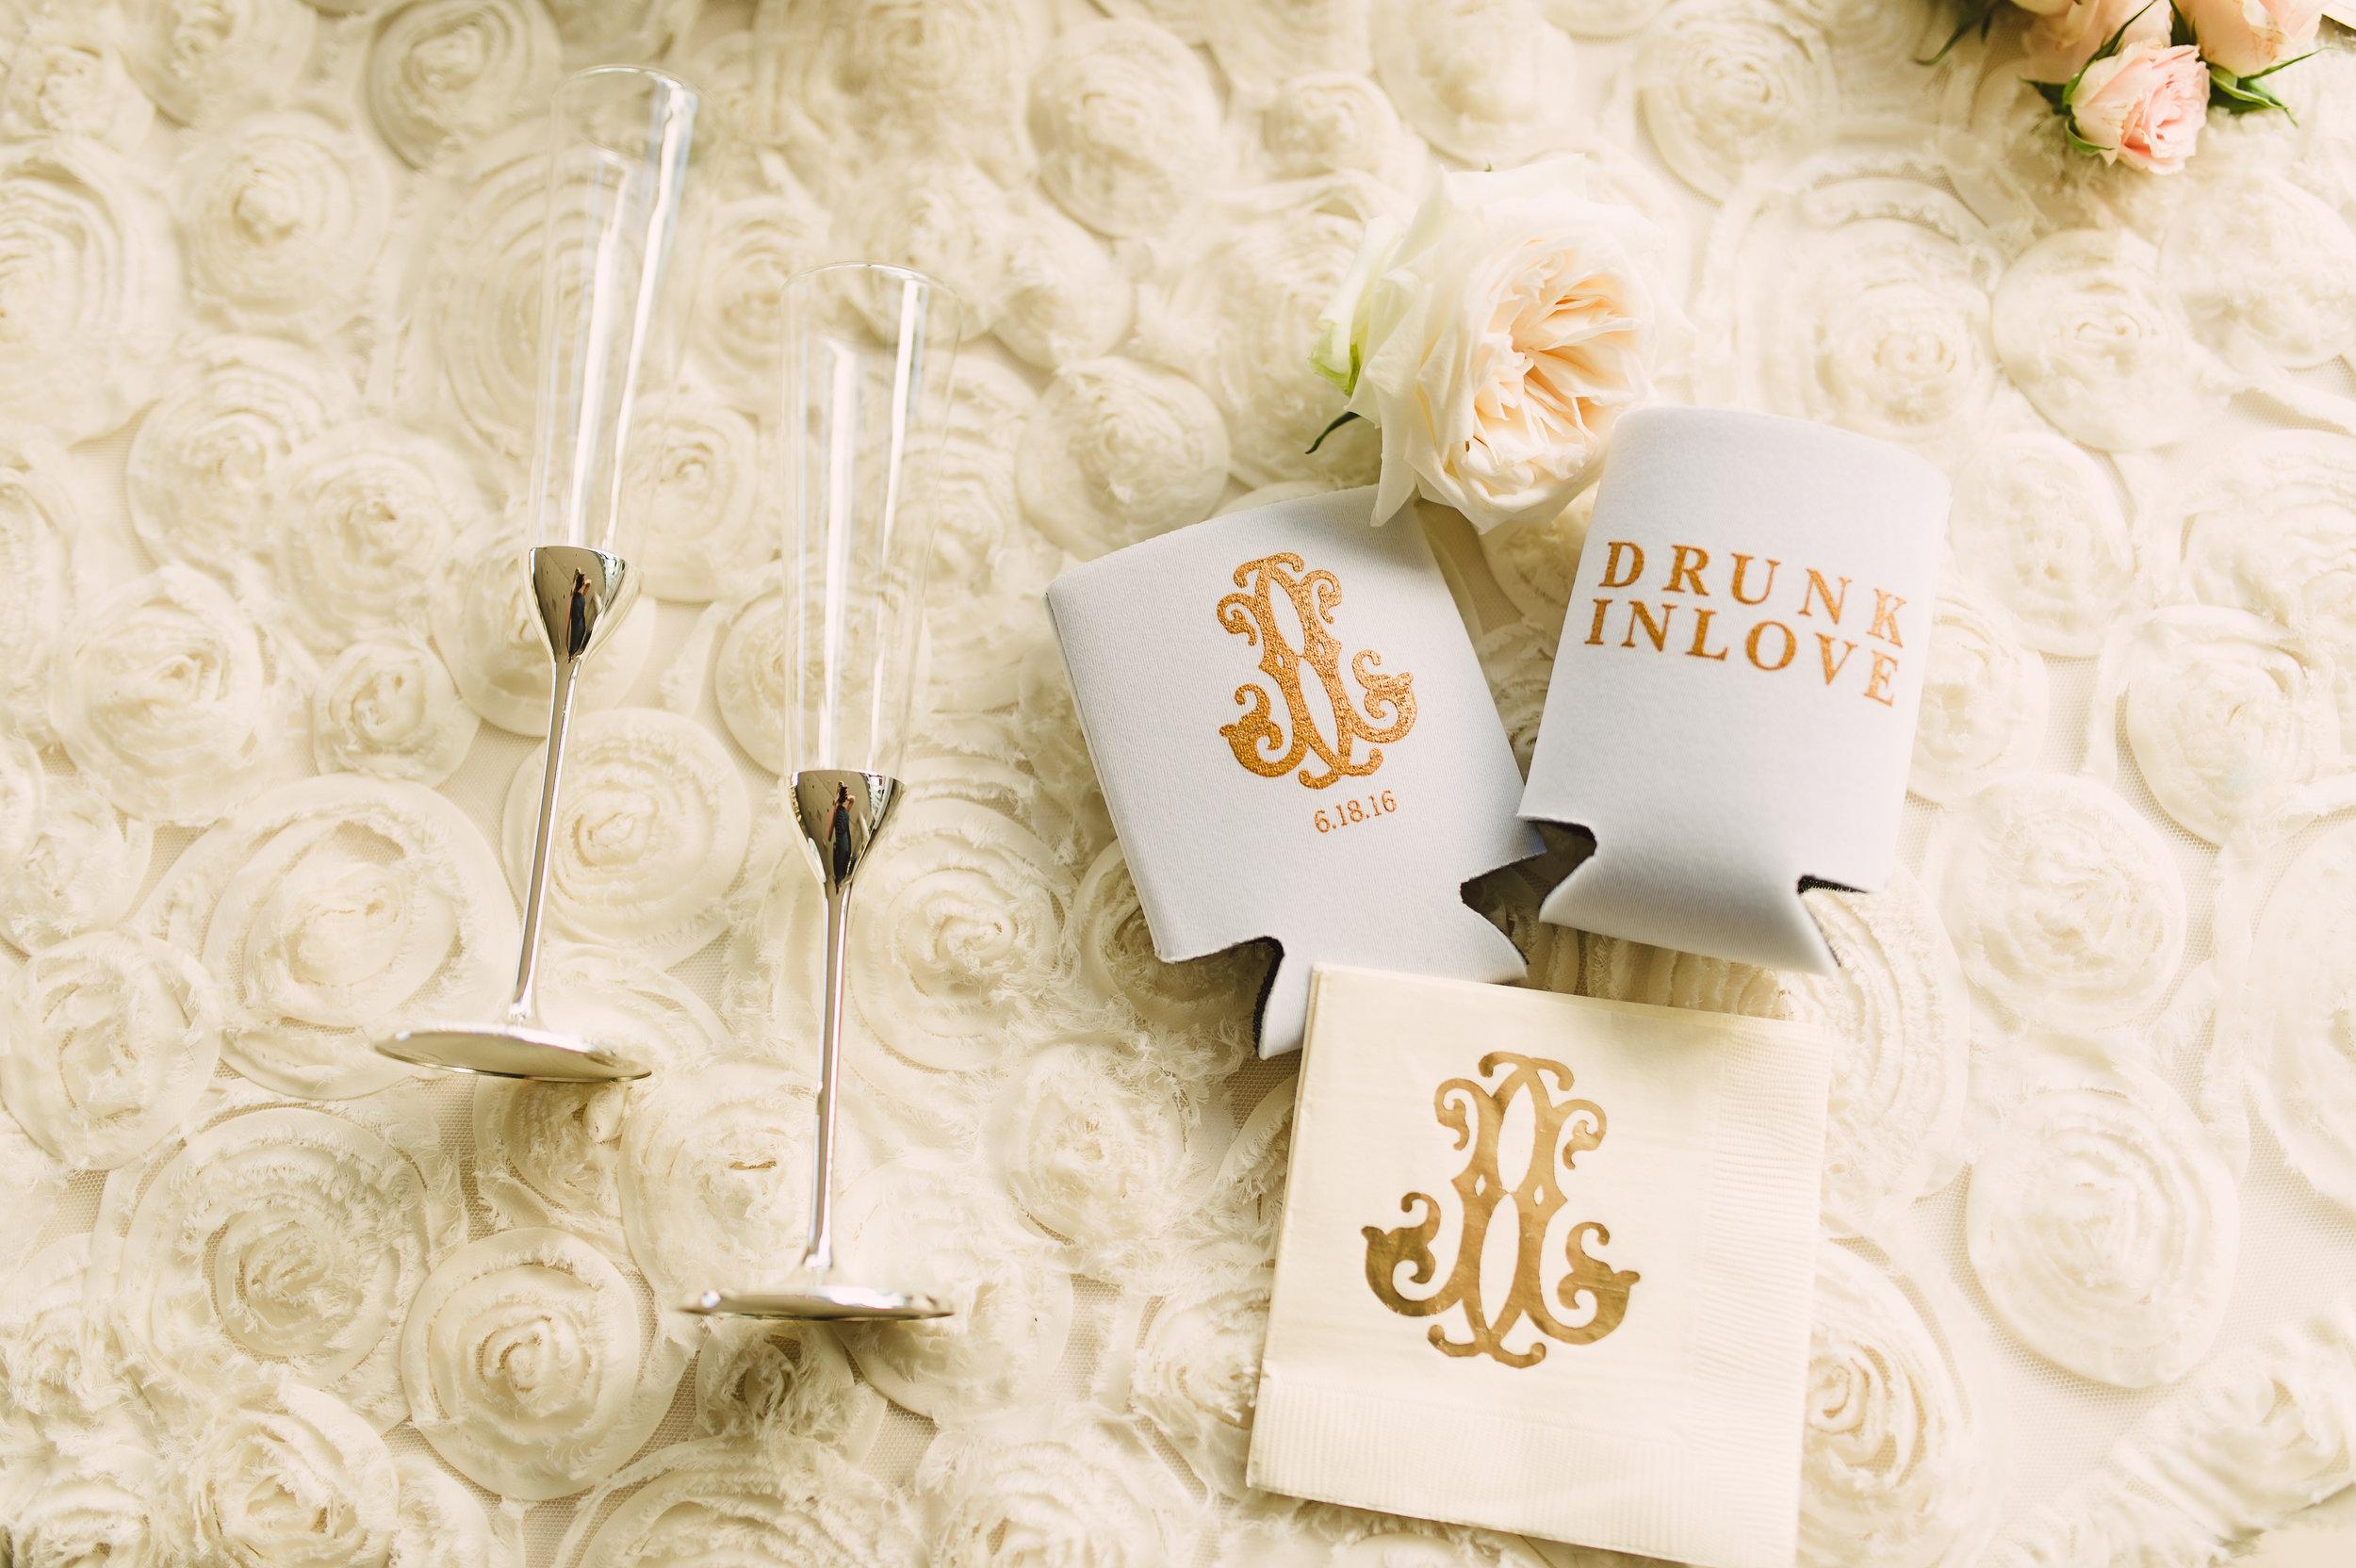 Wedding monogram, Wedding koozie, Wedding cocktail napkin, Personalized wedding decorations, Personalized wedding, Wedding details, Fun wedding details, Mint Museum Uptown wedding in Charlotte, North Carolina by The Graceful Host